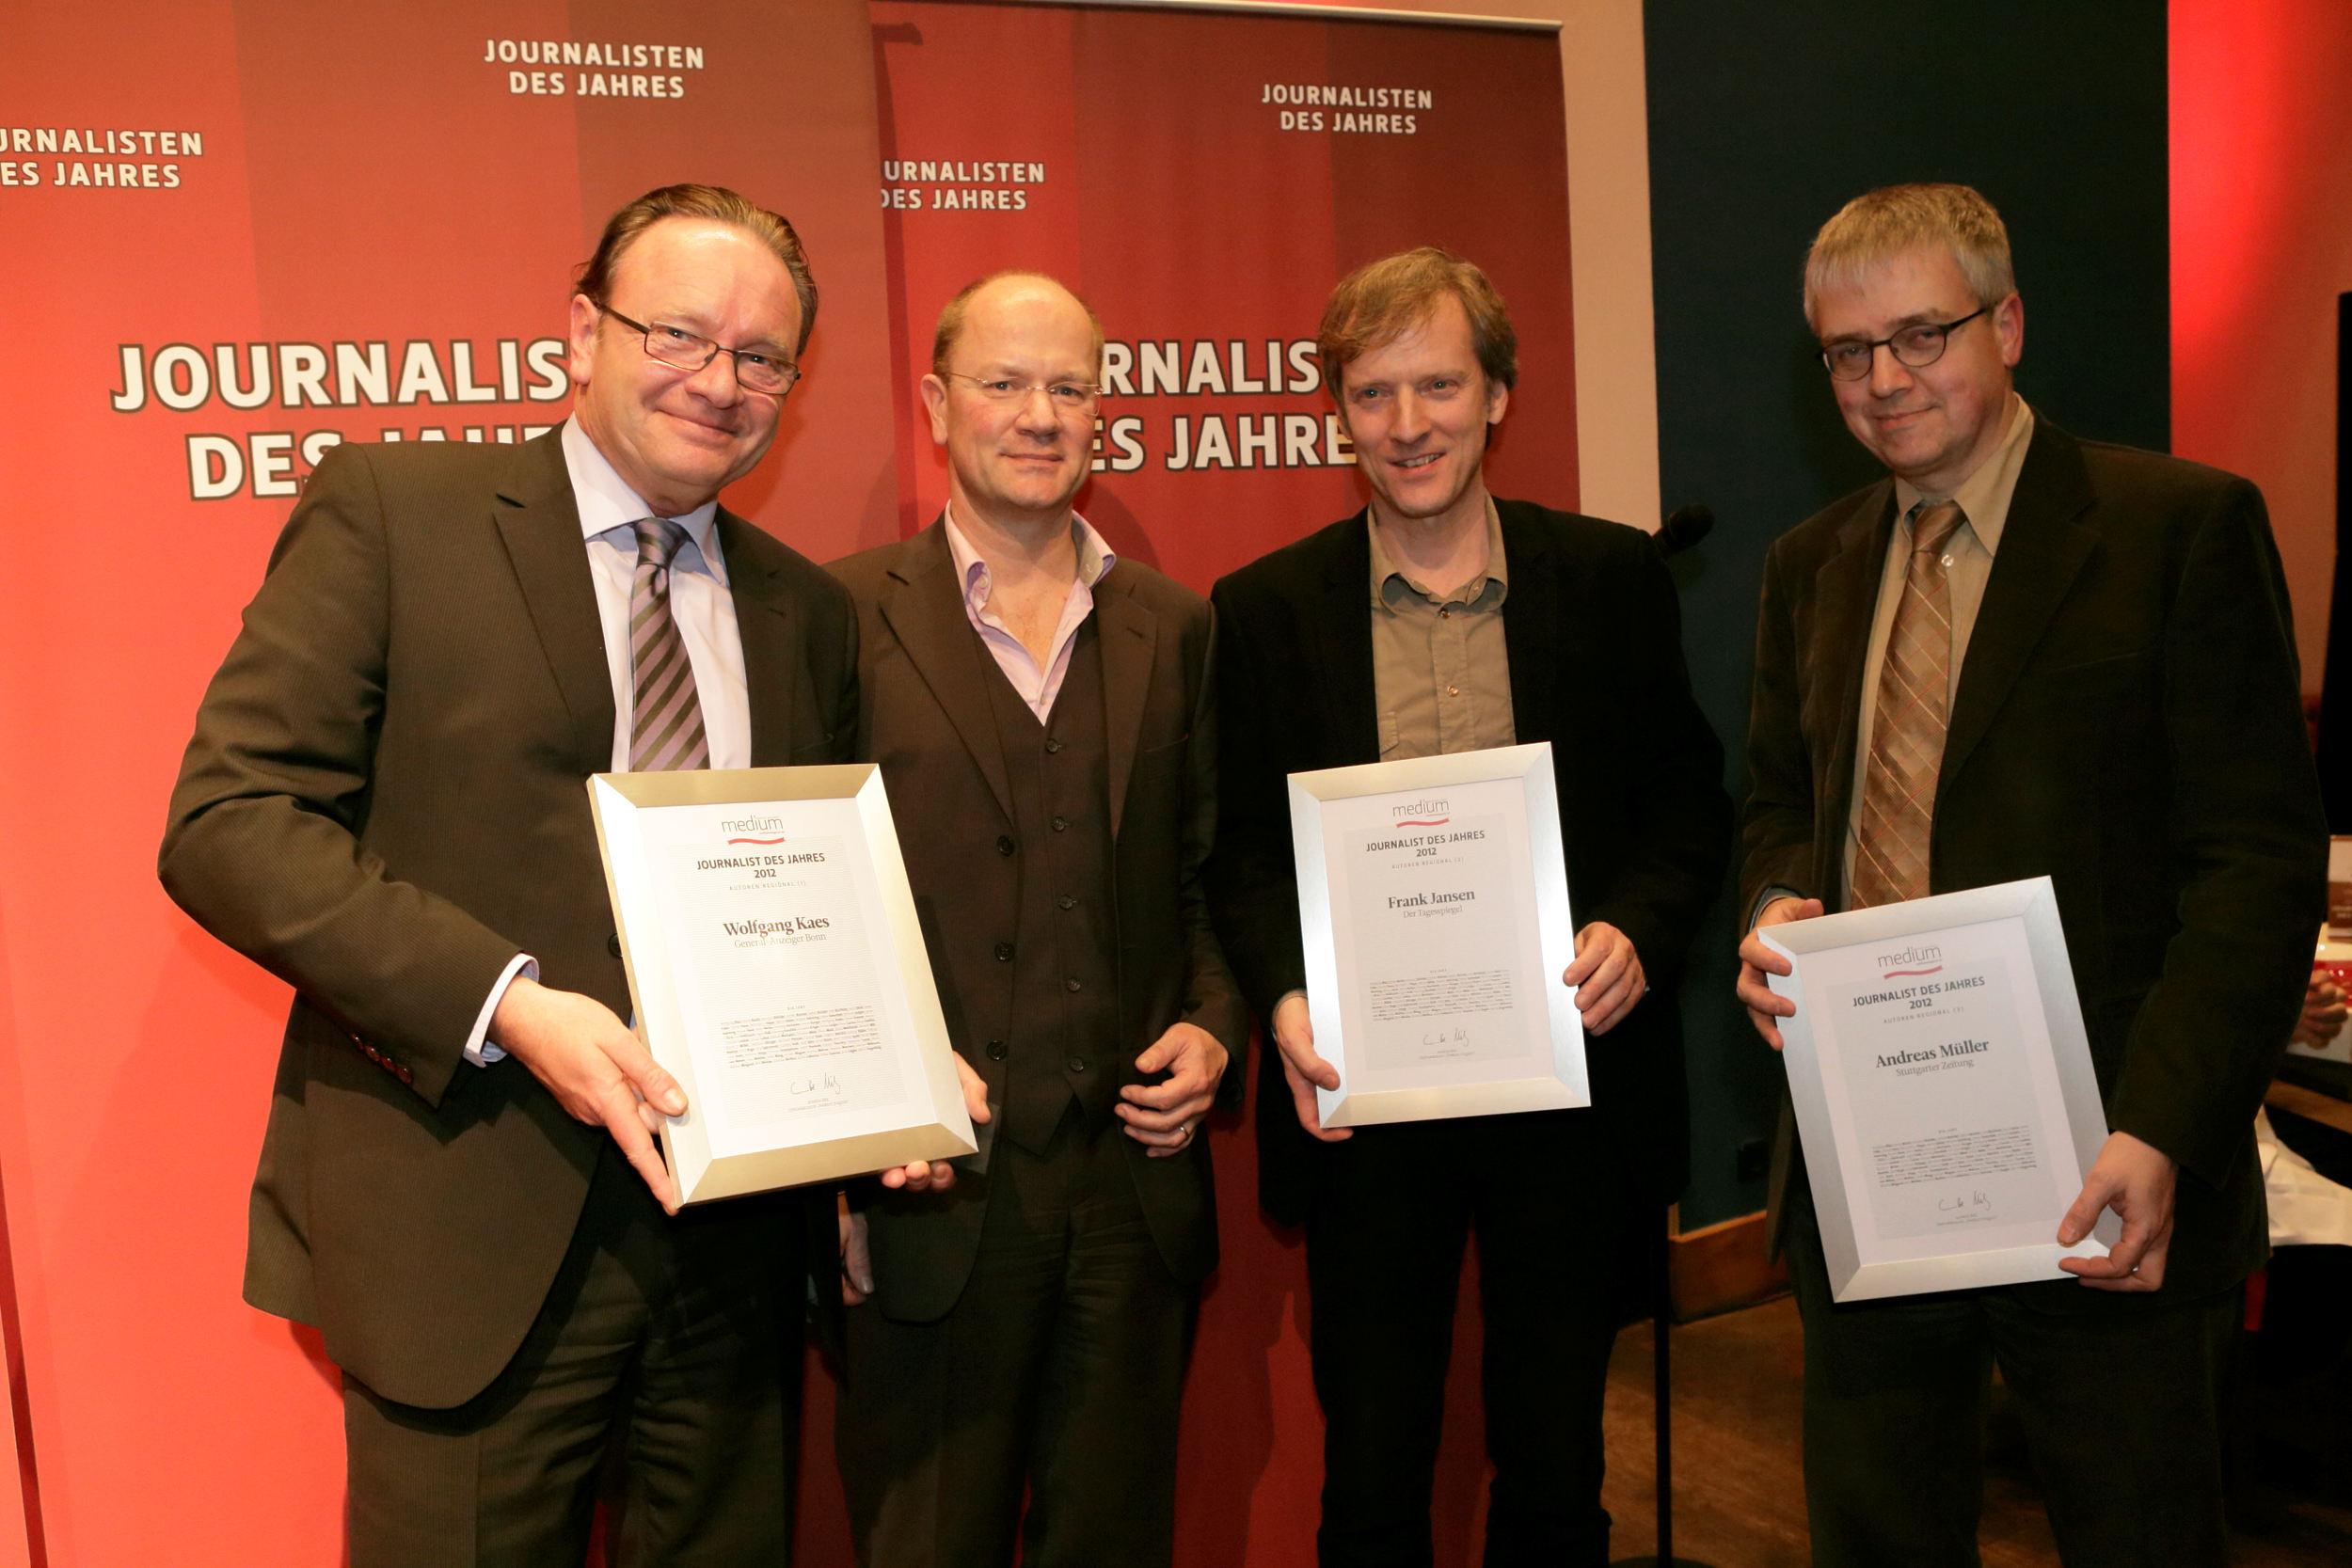 Wolfgang Kaes (Bonner Generalanzeiger), Autor (regional) des Jahres 2012